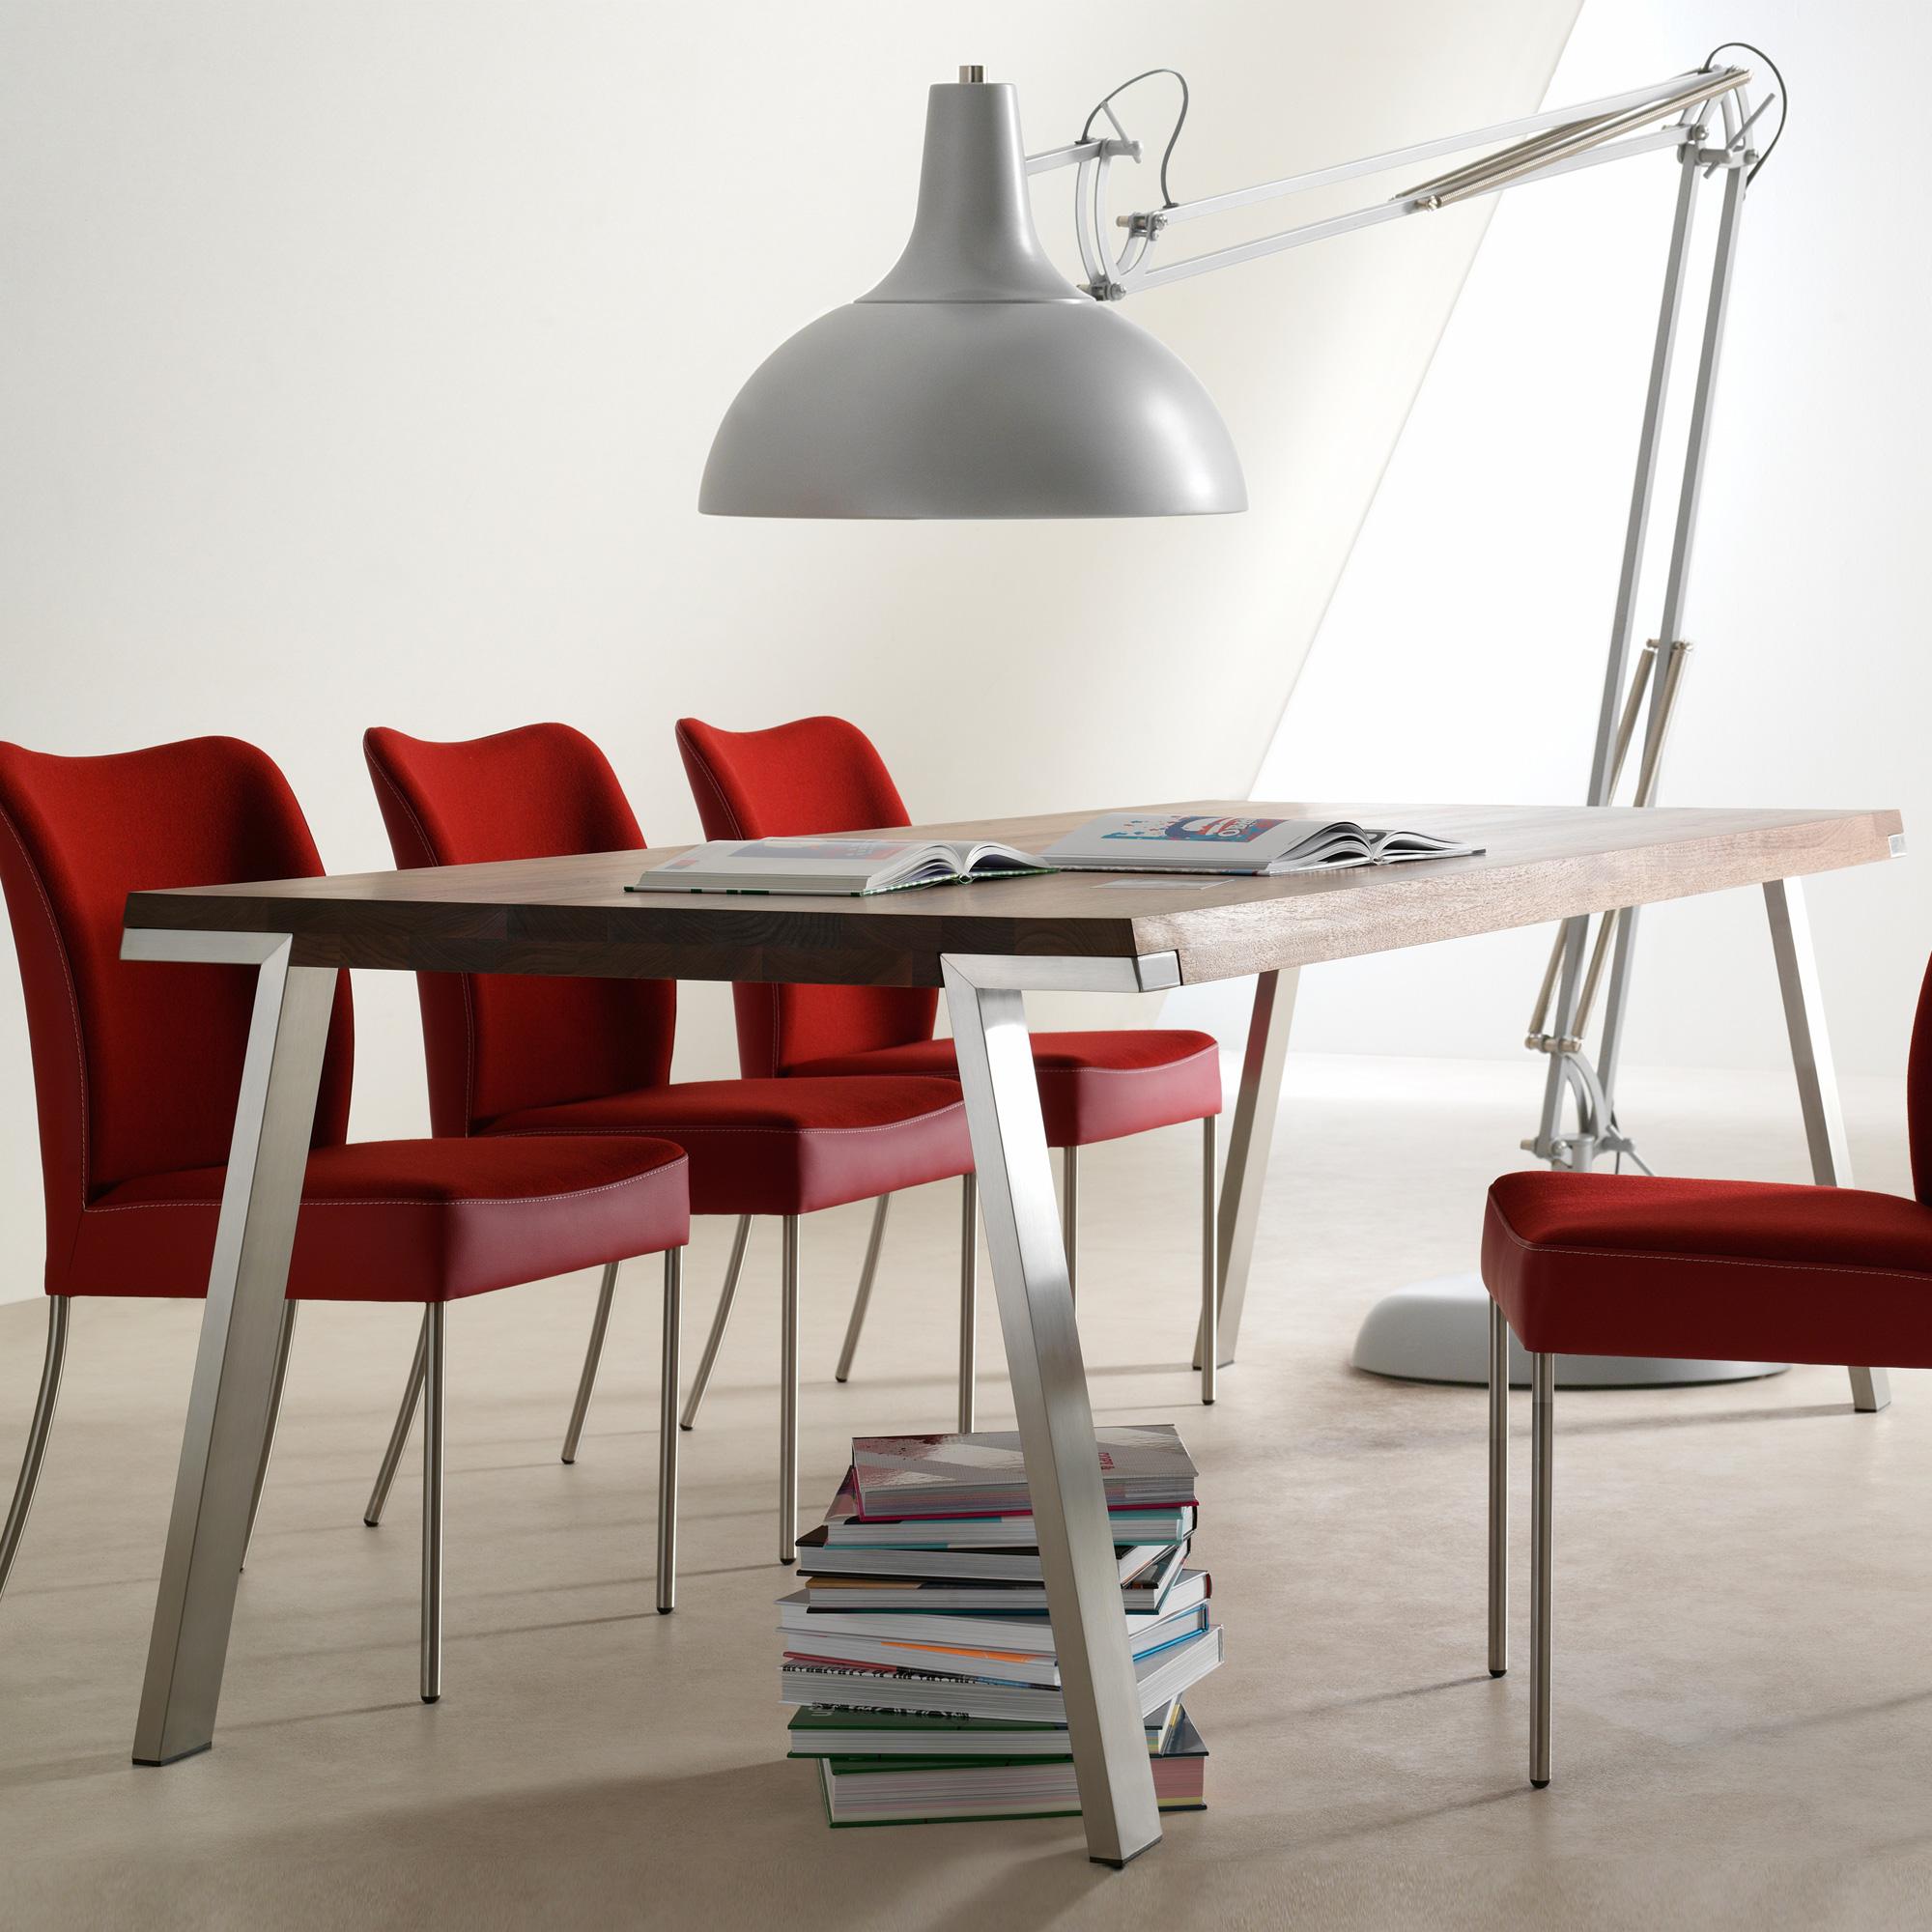 bert plantagie seven tisch seventisch 200x100 nussb astig reuter onlineshop. Black Bedroom Furniture Sets. Home Design Ideas